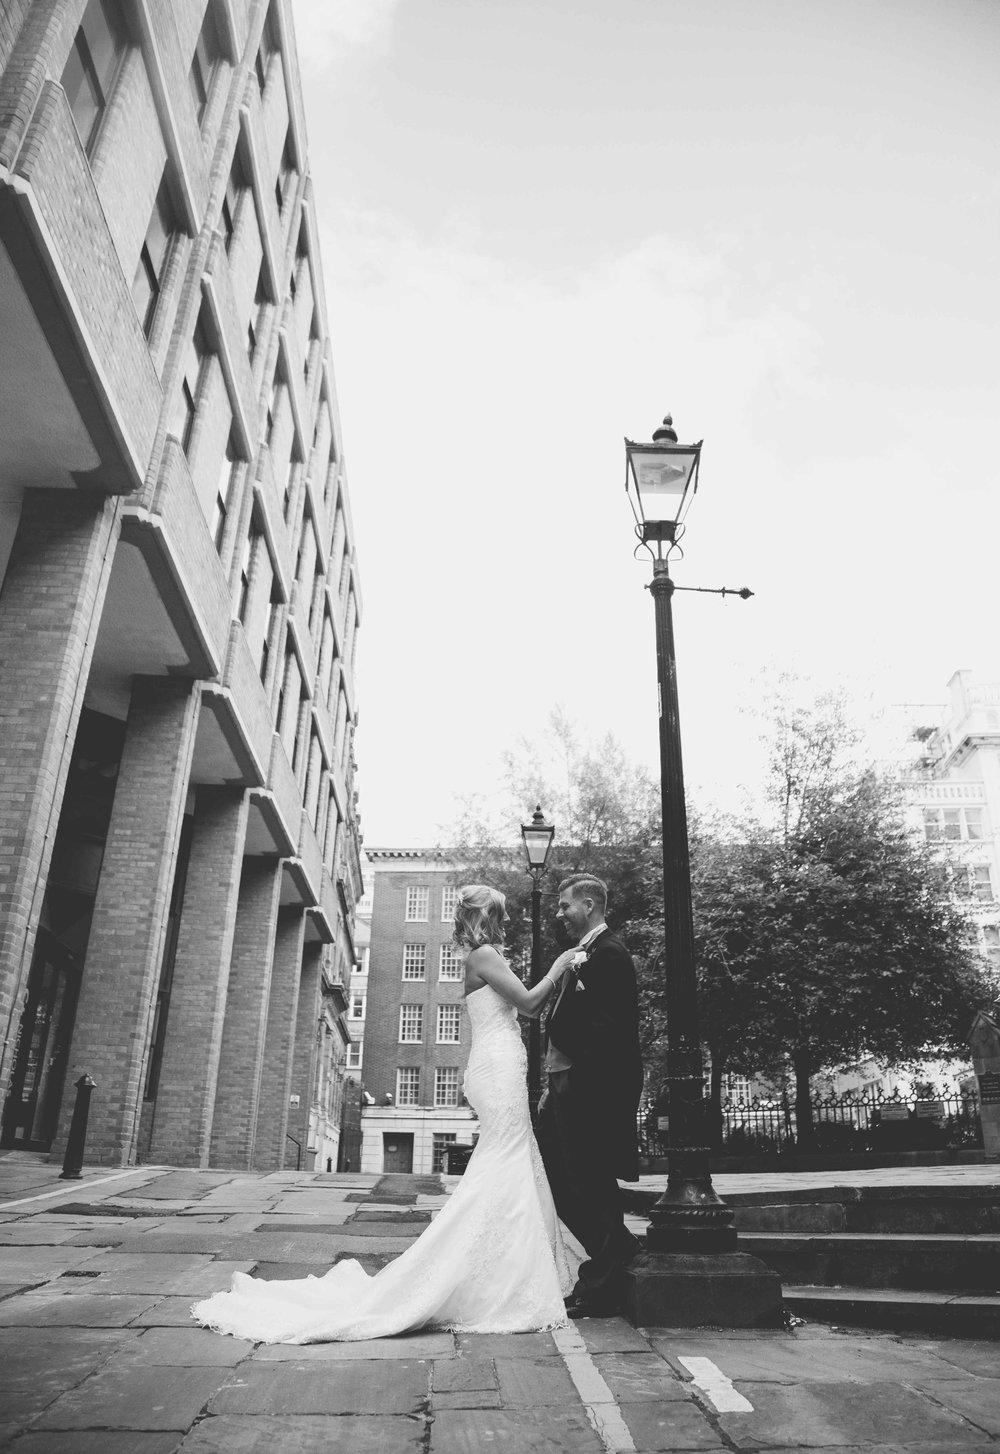 Rauquet_Club_Wedding_photography_Liverpool_heatherelizabethphotography (132 of 164).jpg